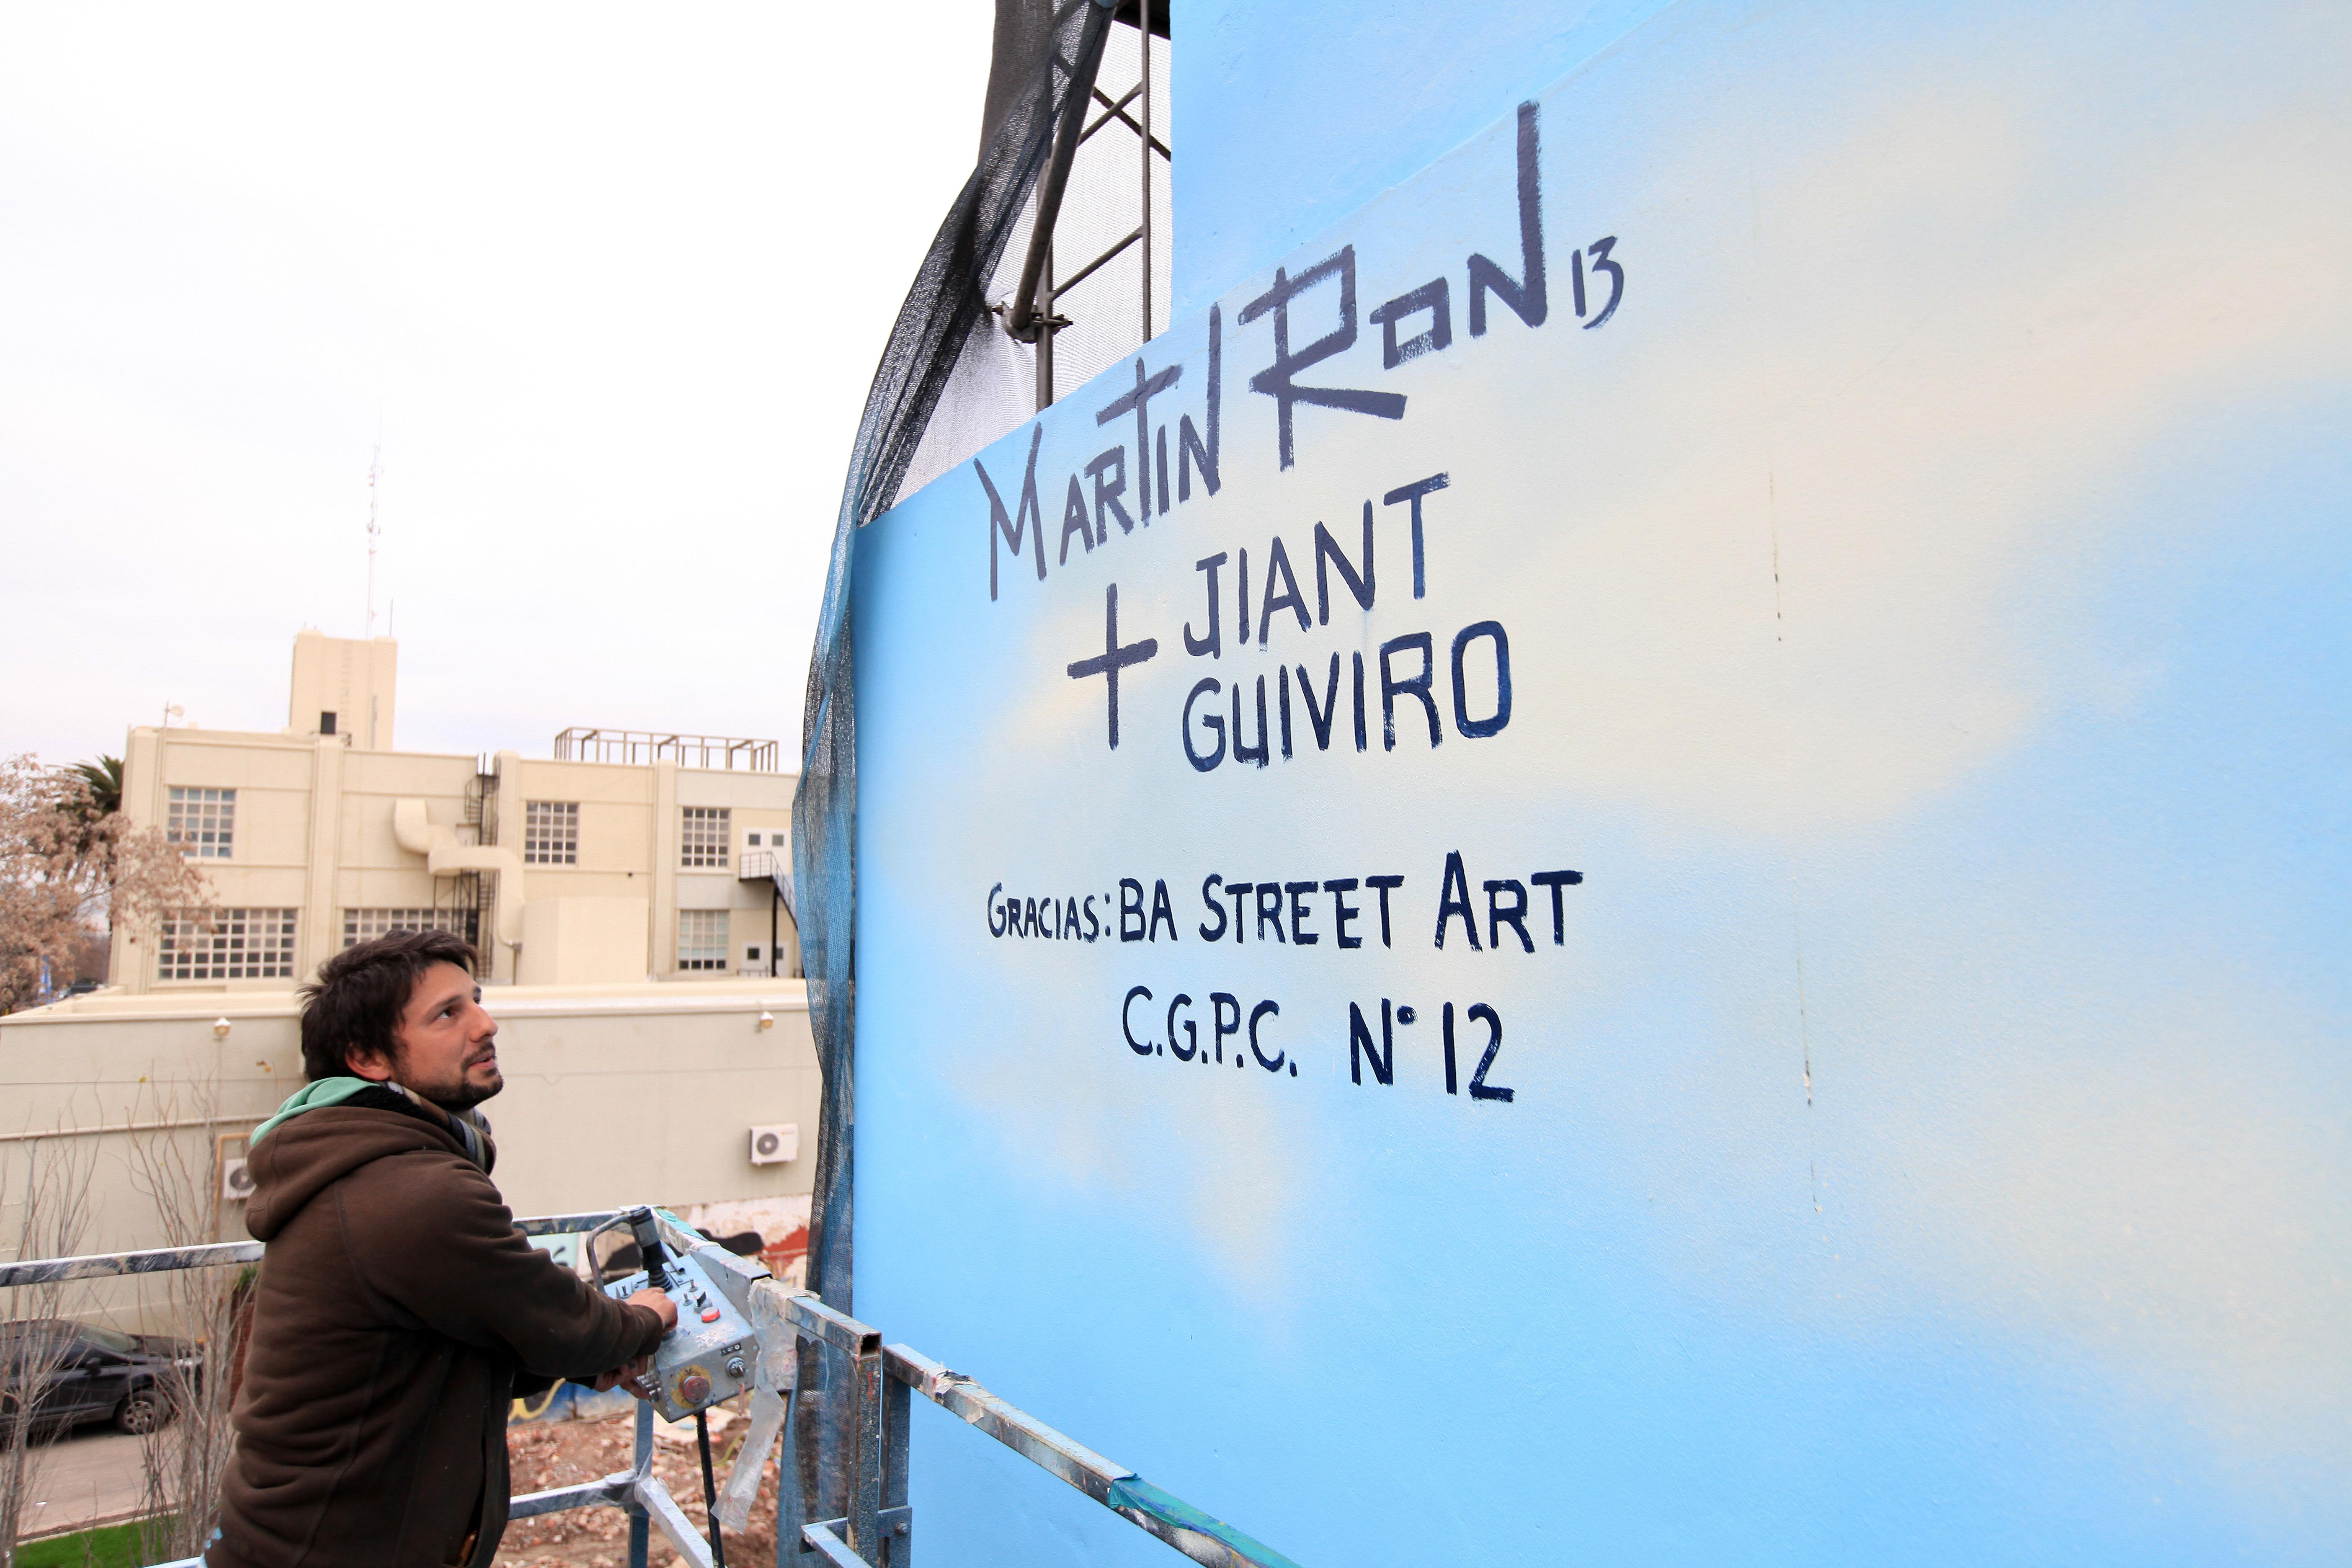 street artist signing mural martin ron curado por buenos aires street art jiant guiviro villa urquiza argentina